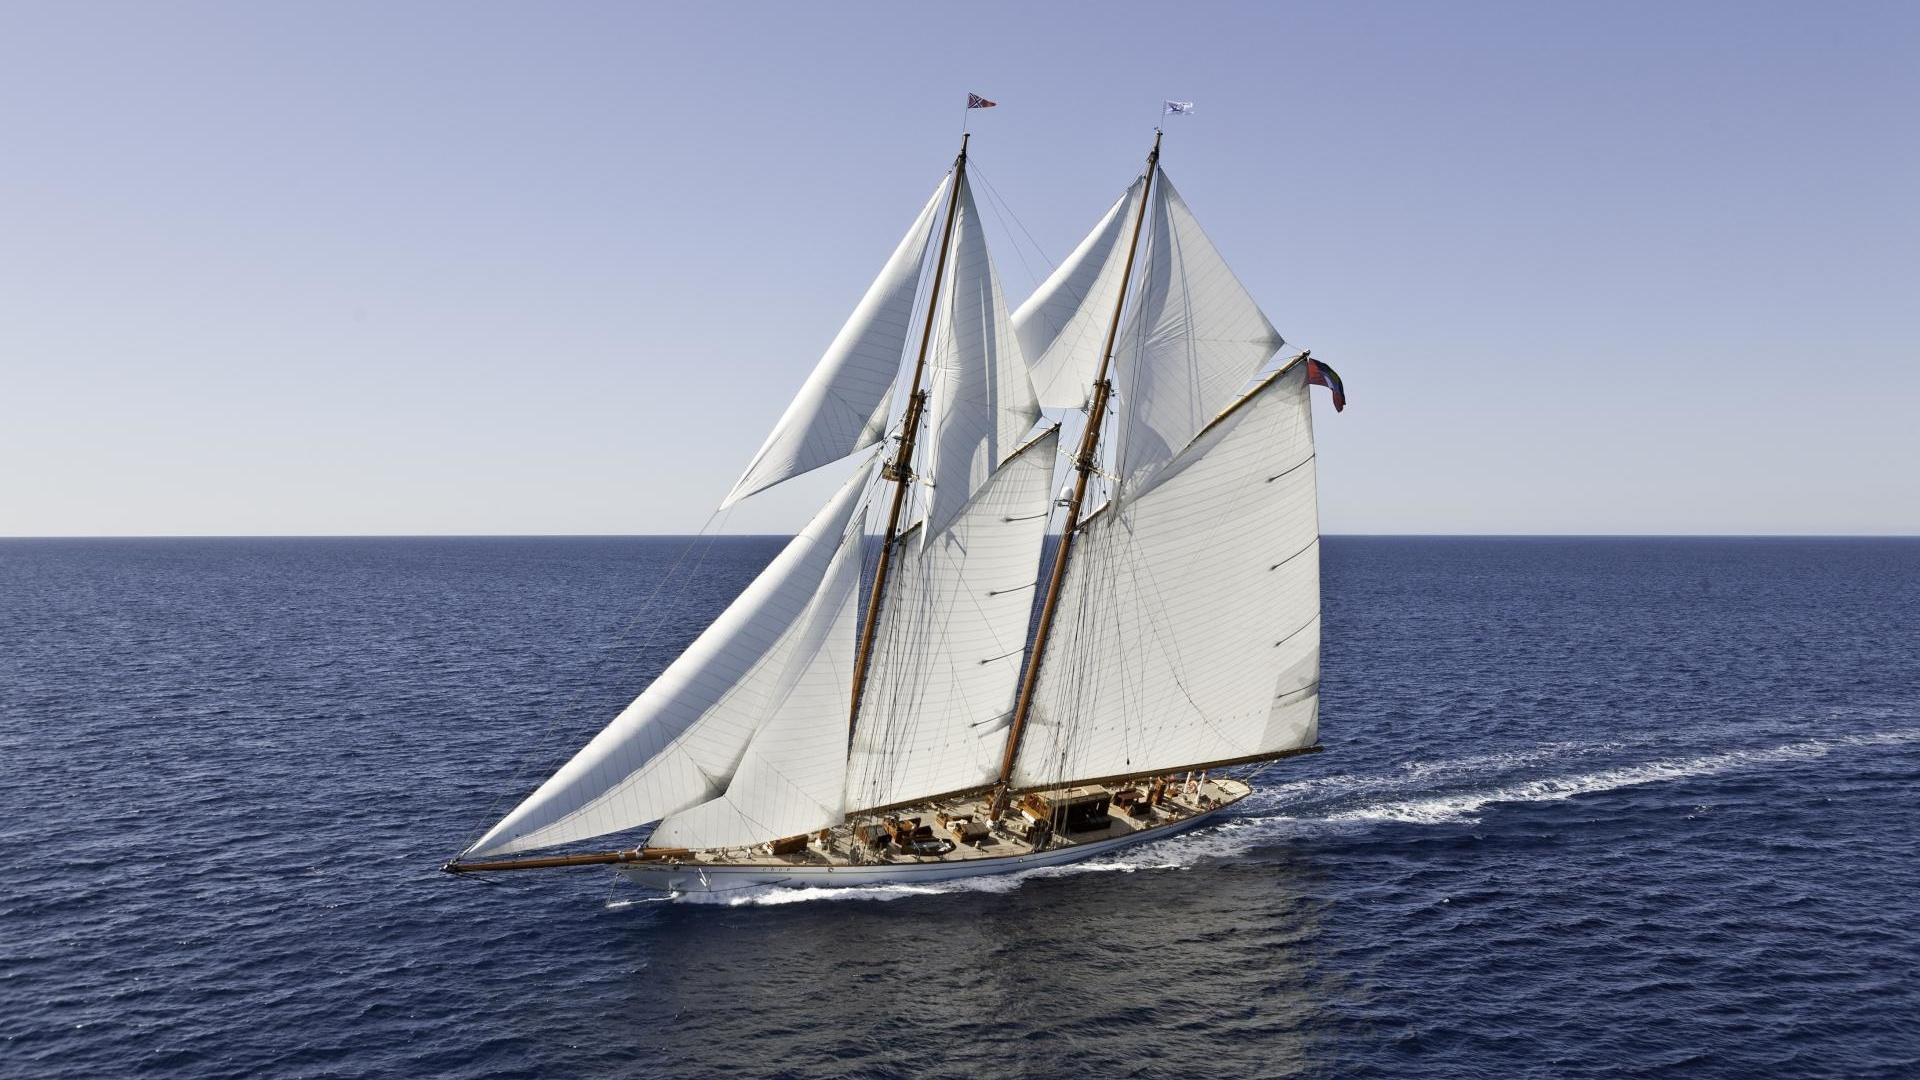 картинка ветер корабли канале можете